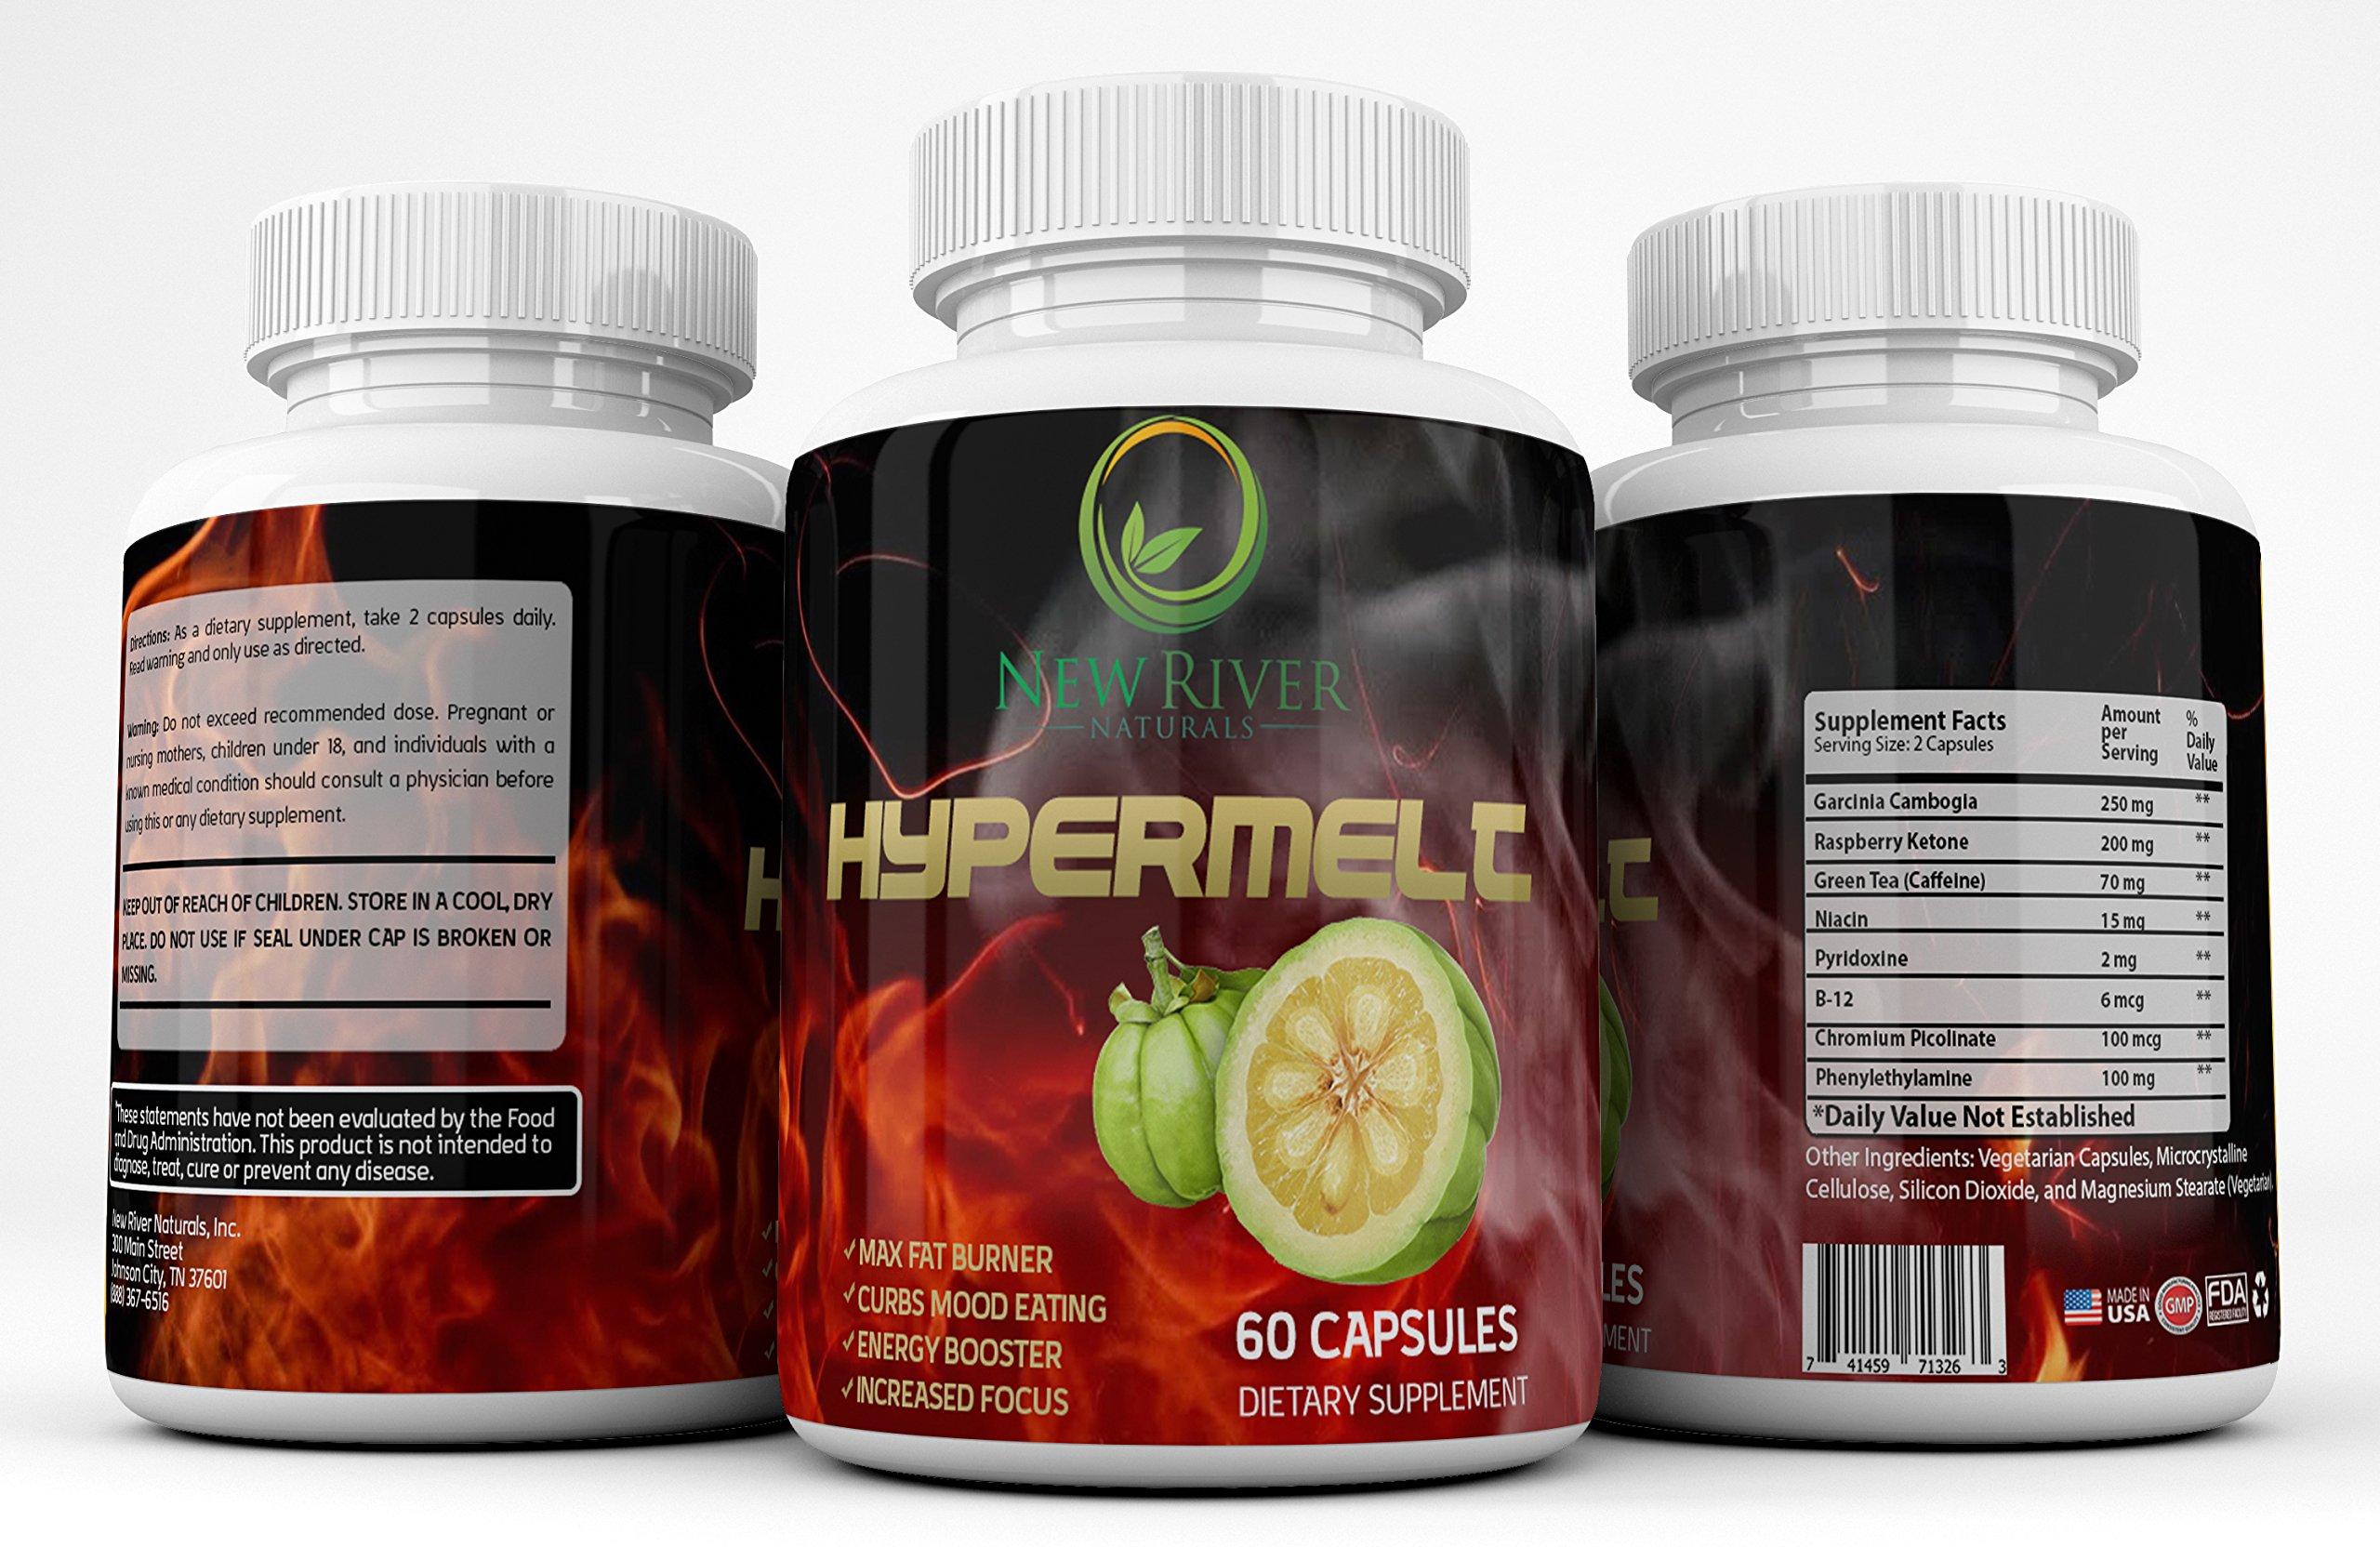 HyperMelt **2-Pack** Natural Fat Burner Weight Loss Supplement - Max Fat Burner - Curbs Mood Eating - Energy Booster - Increased Focus - Garcinia Cambogia - Raspberry Ketones - Green Tea - B12